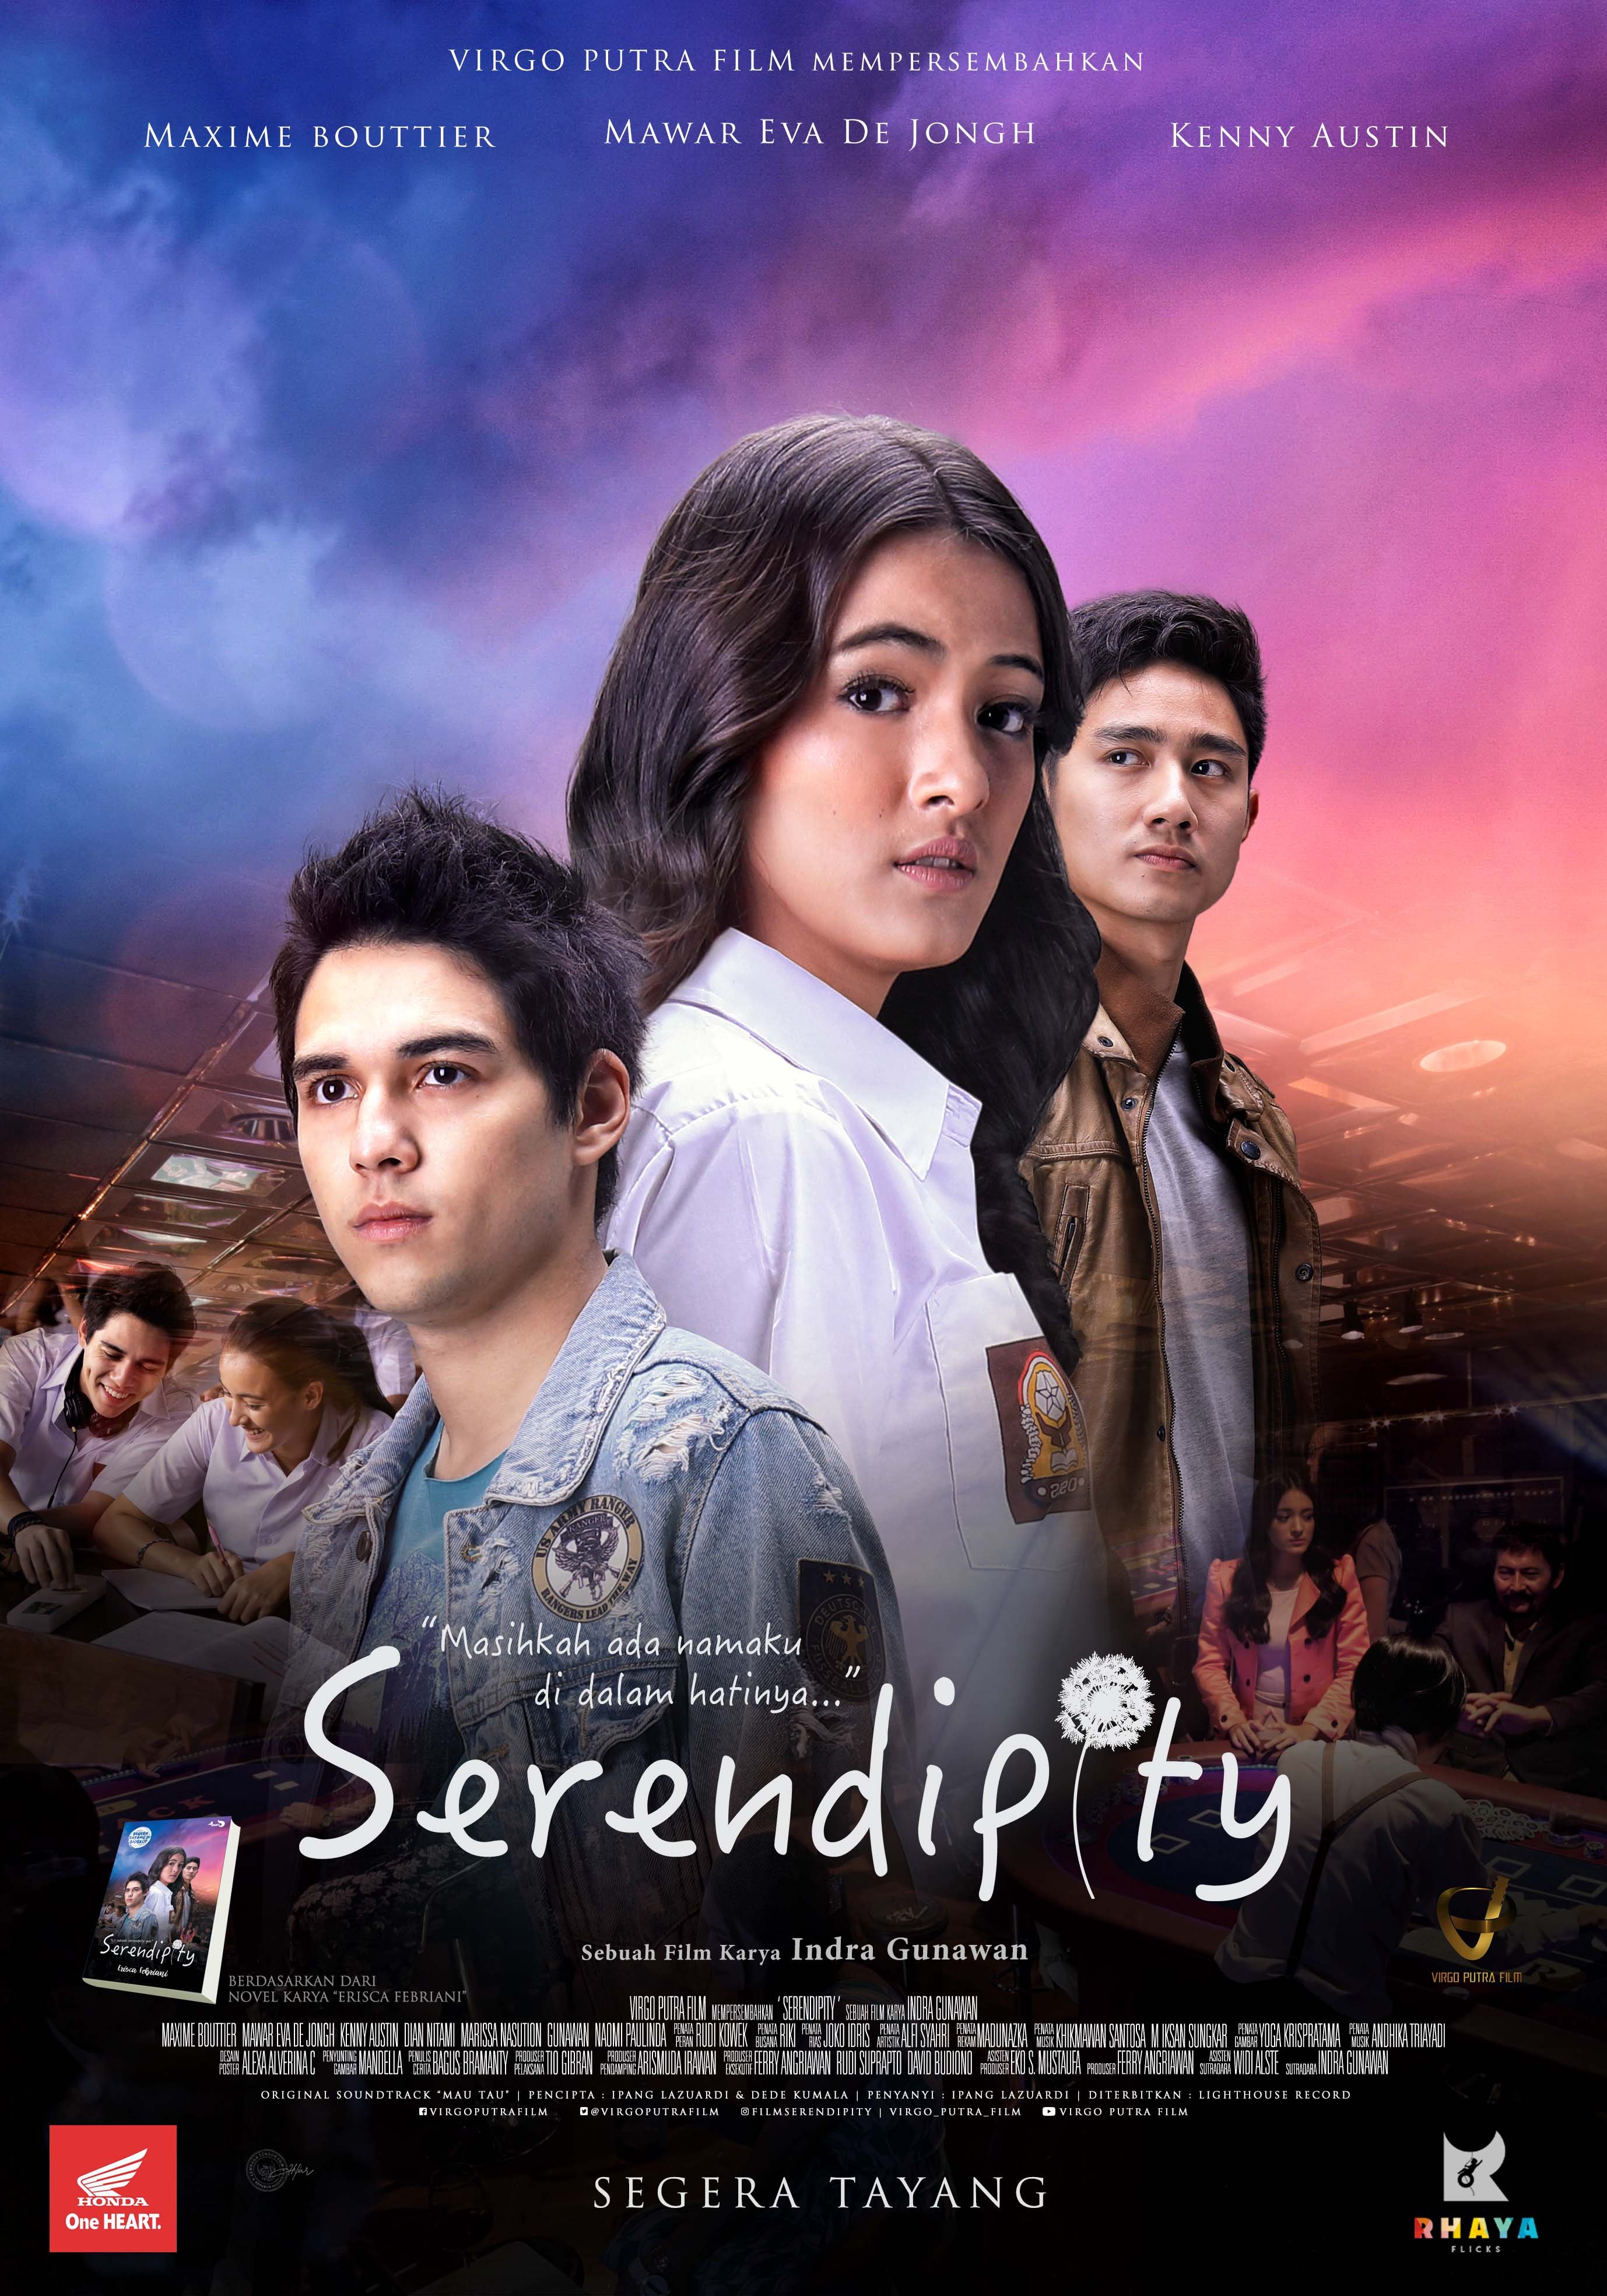 Serendipity 2018 Imdb